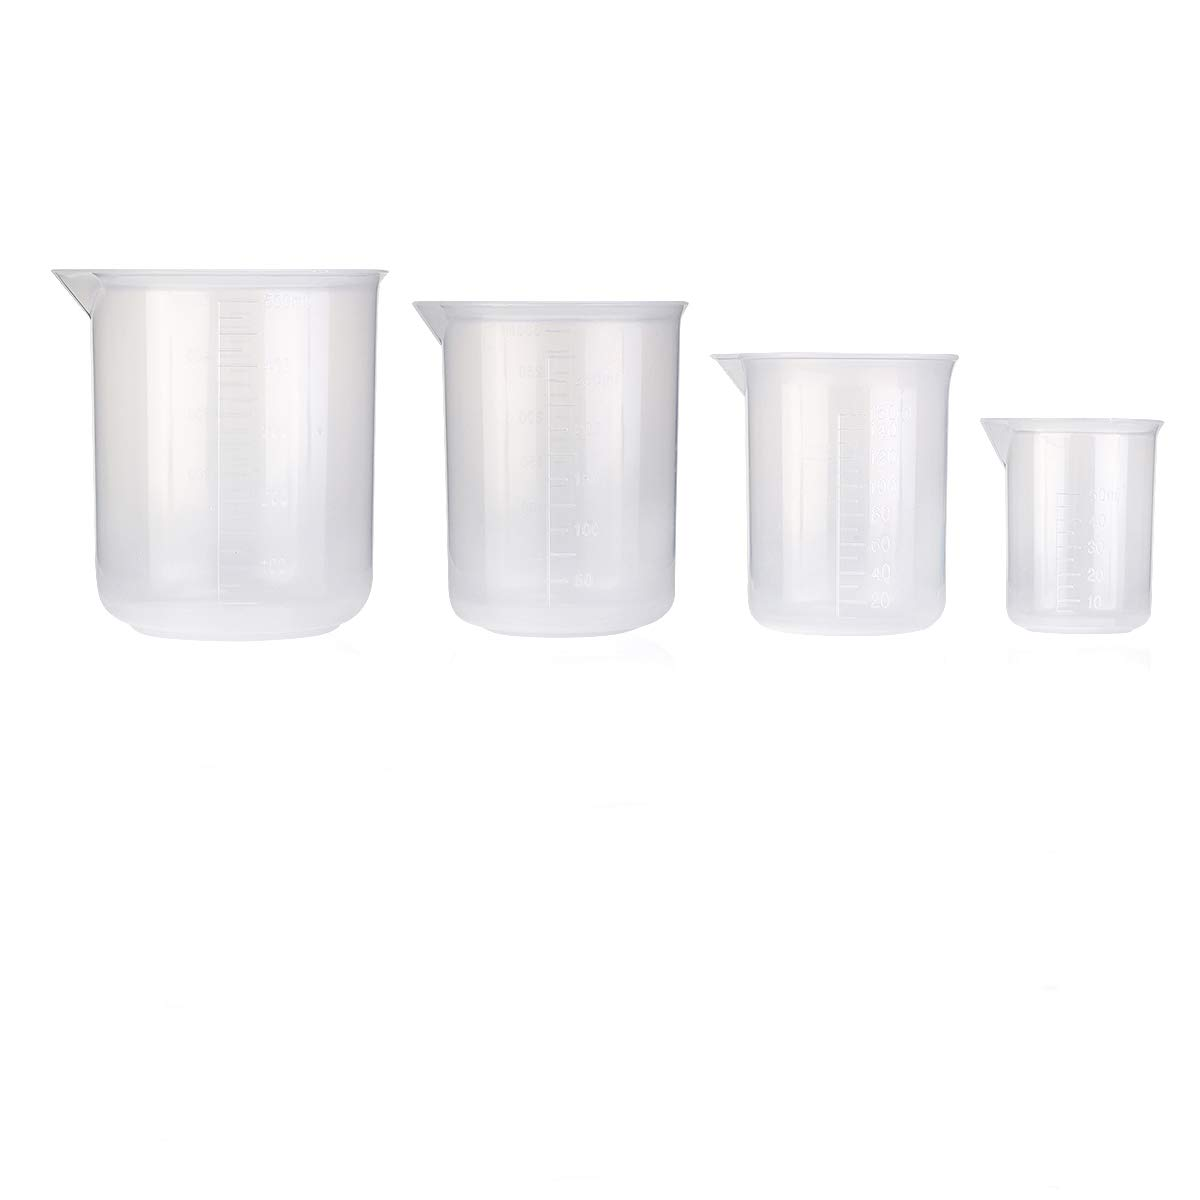 ULTNICE Plastic Beaker Measuring Cup Labs Plastic Graduated Beakers 50ml 150ml 250ml 500ml -Pack of 4